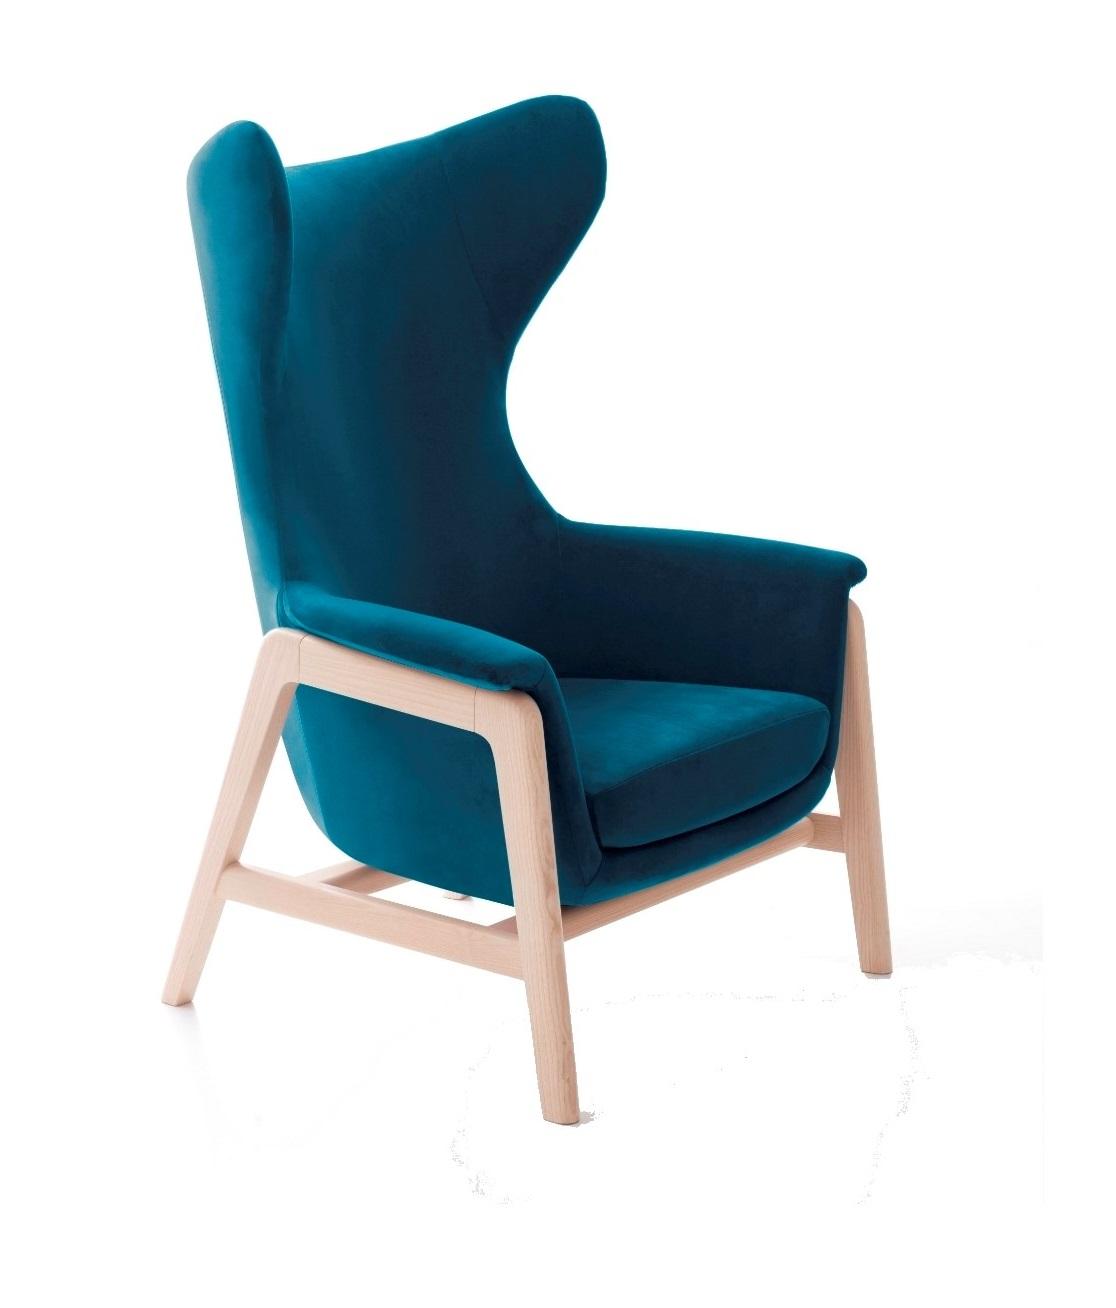 Cloud Lounge Chair High Back